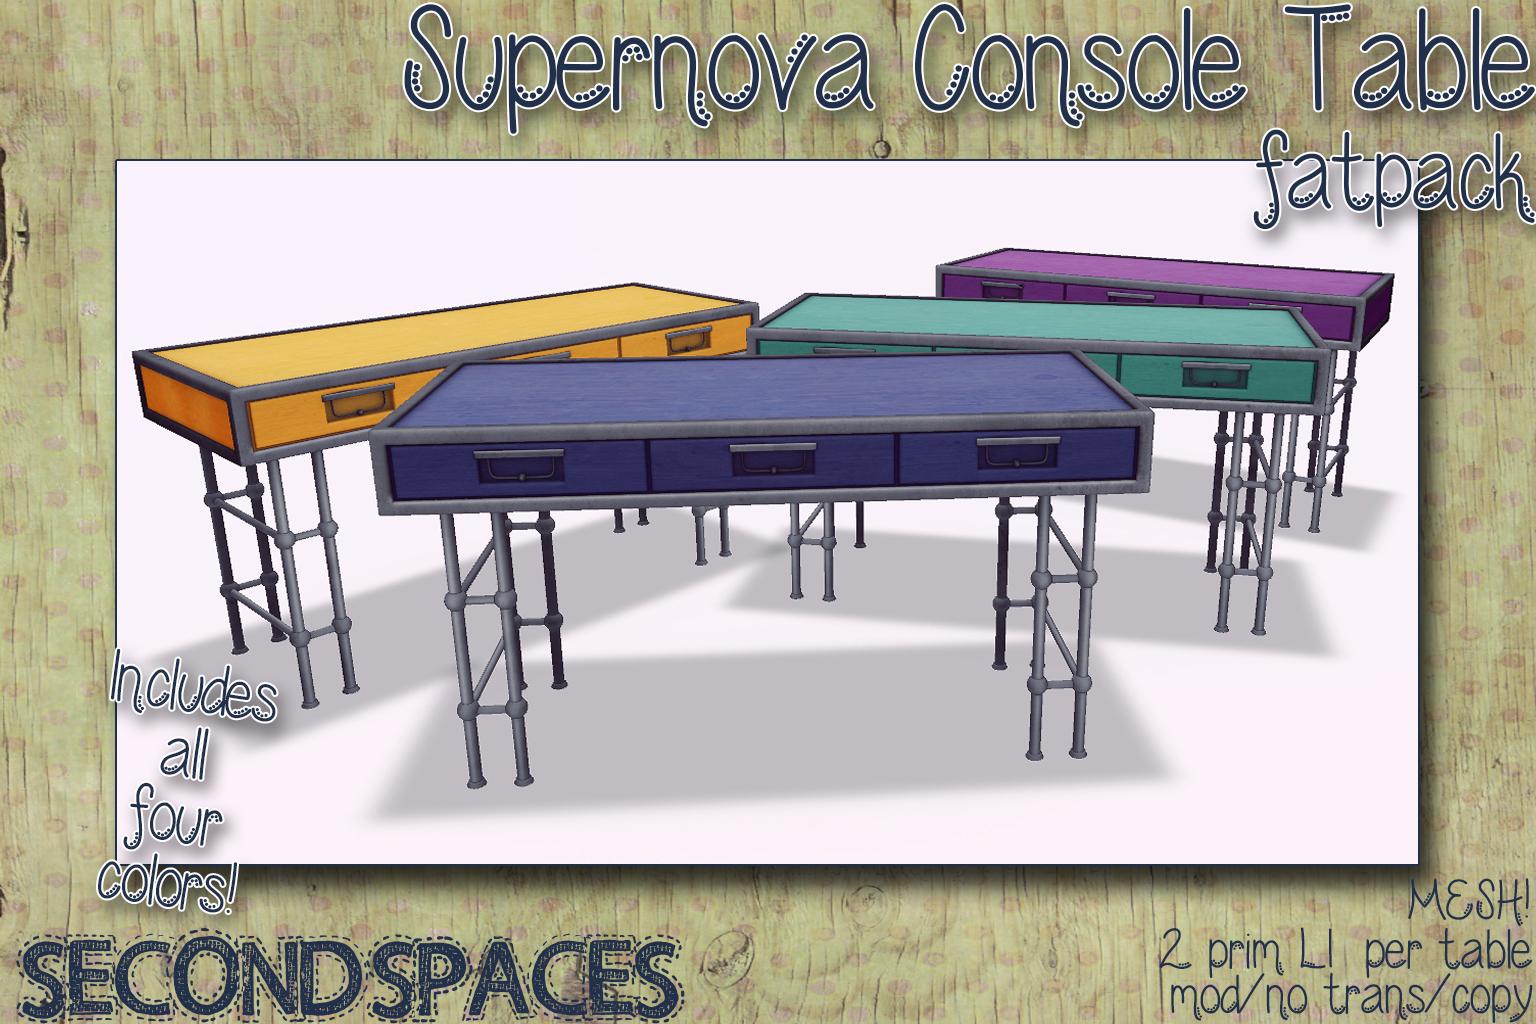 supernova console table_fatpack_vendor.jpg